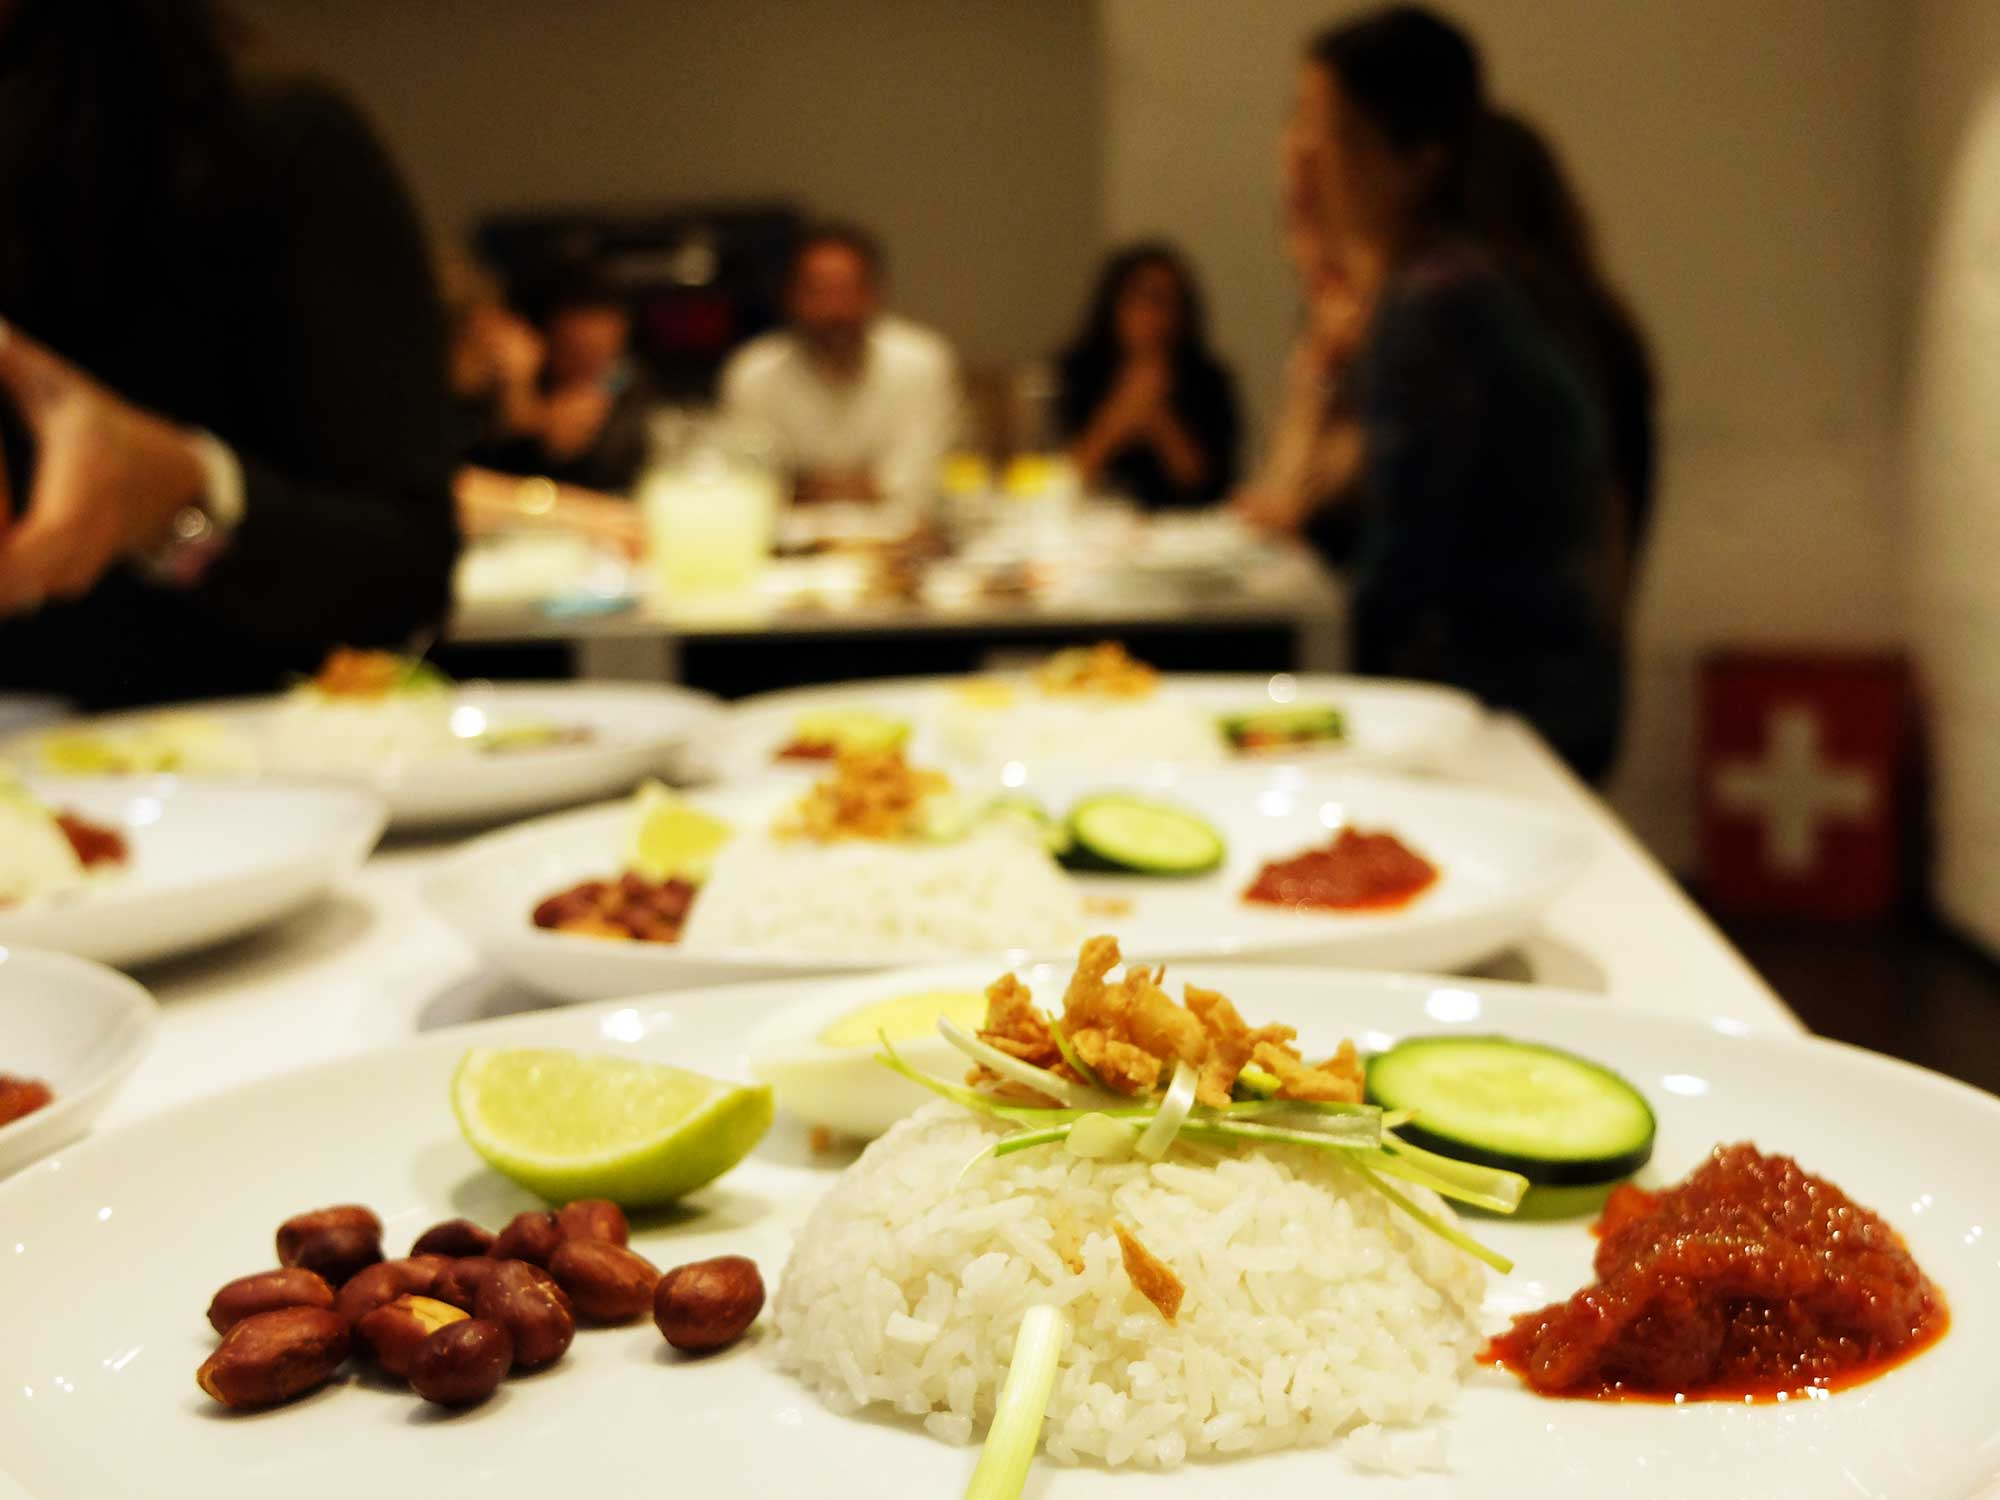 Talleres de cocina. Espacio Polivalente Interiorismo Evento privado